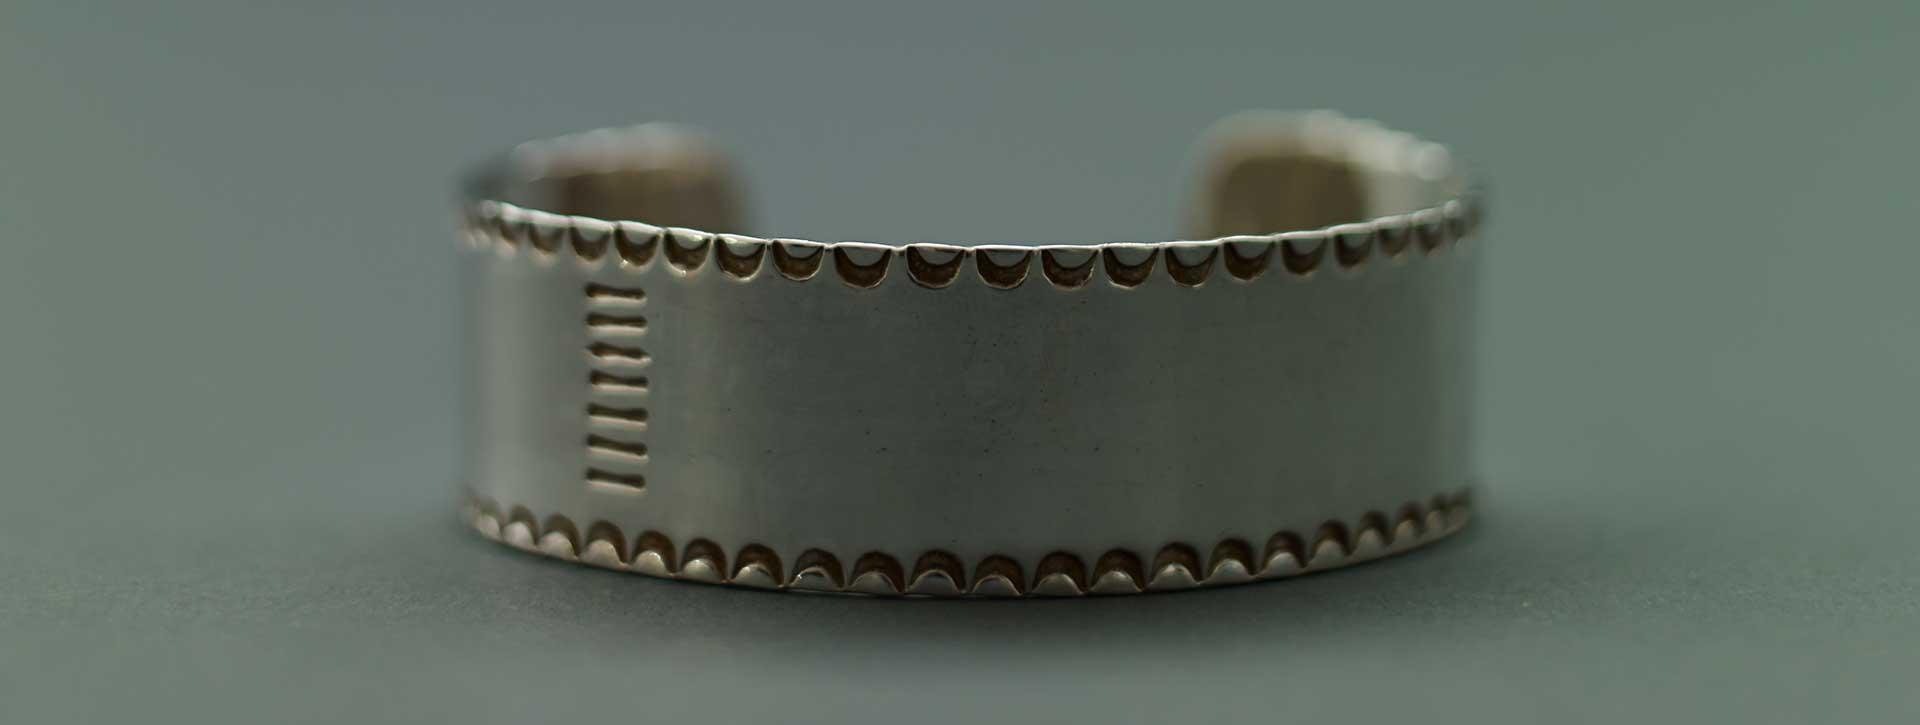 flat wide bangle